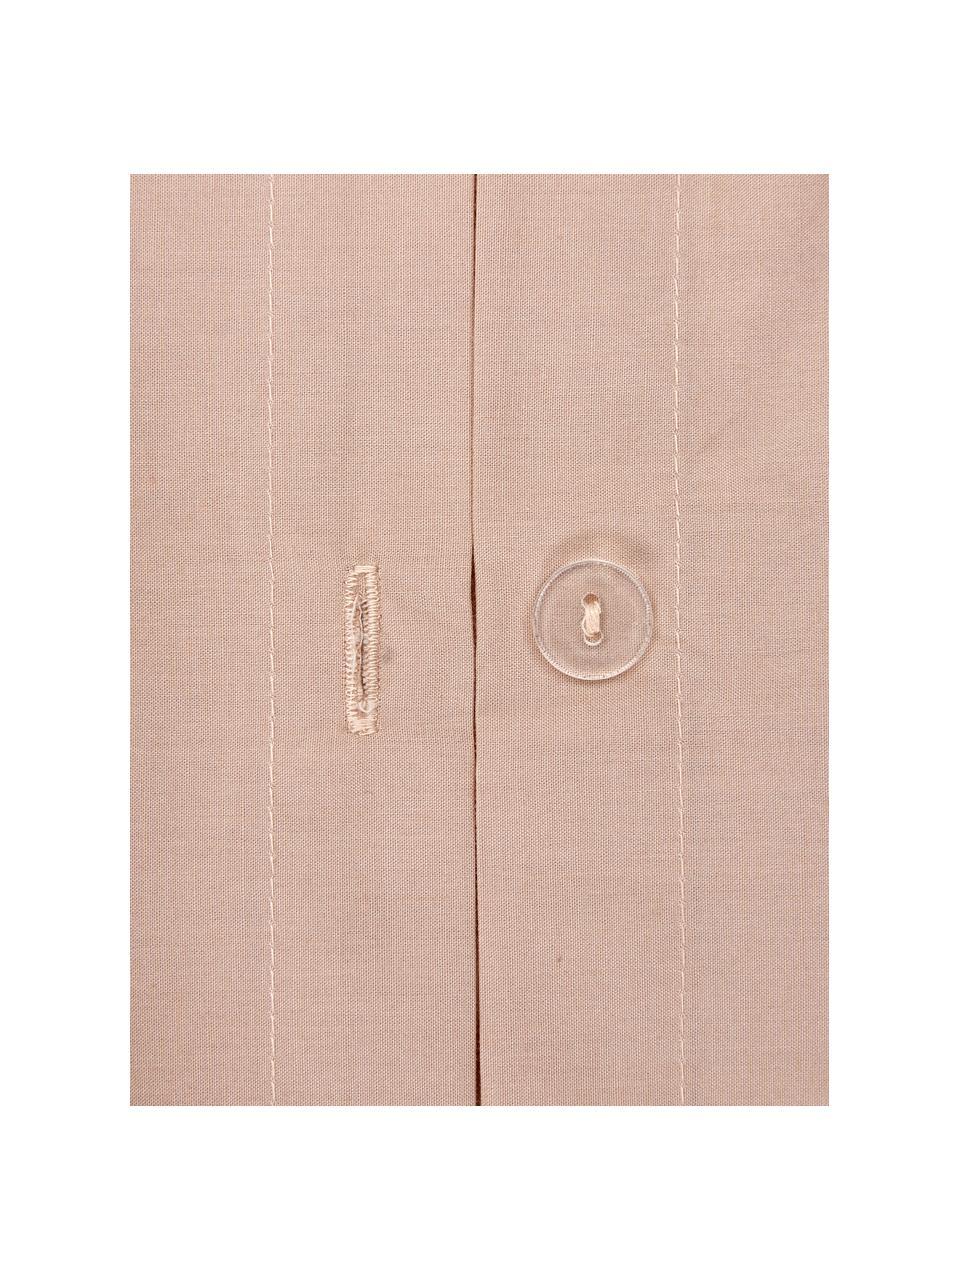 Baumwollperkal-Bettwäsche Bommy mit Pompoms, Webart: Perkal Fadendichte 200 TC, Rosa, 135 x 200 cm + 1 Kissen 80 x 80 cm